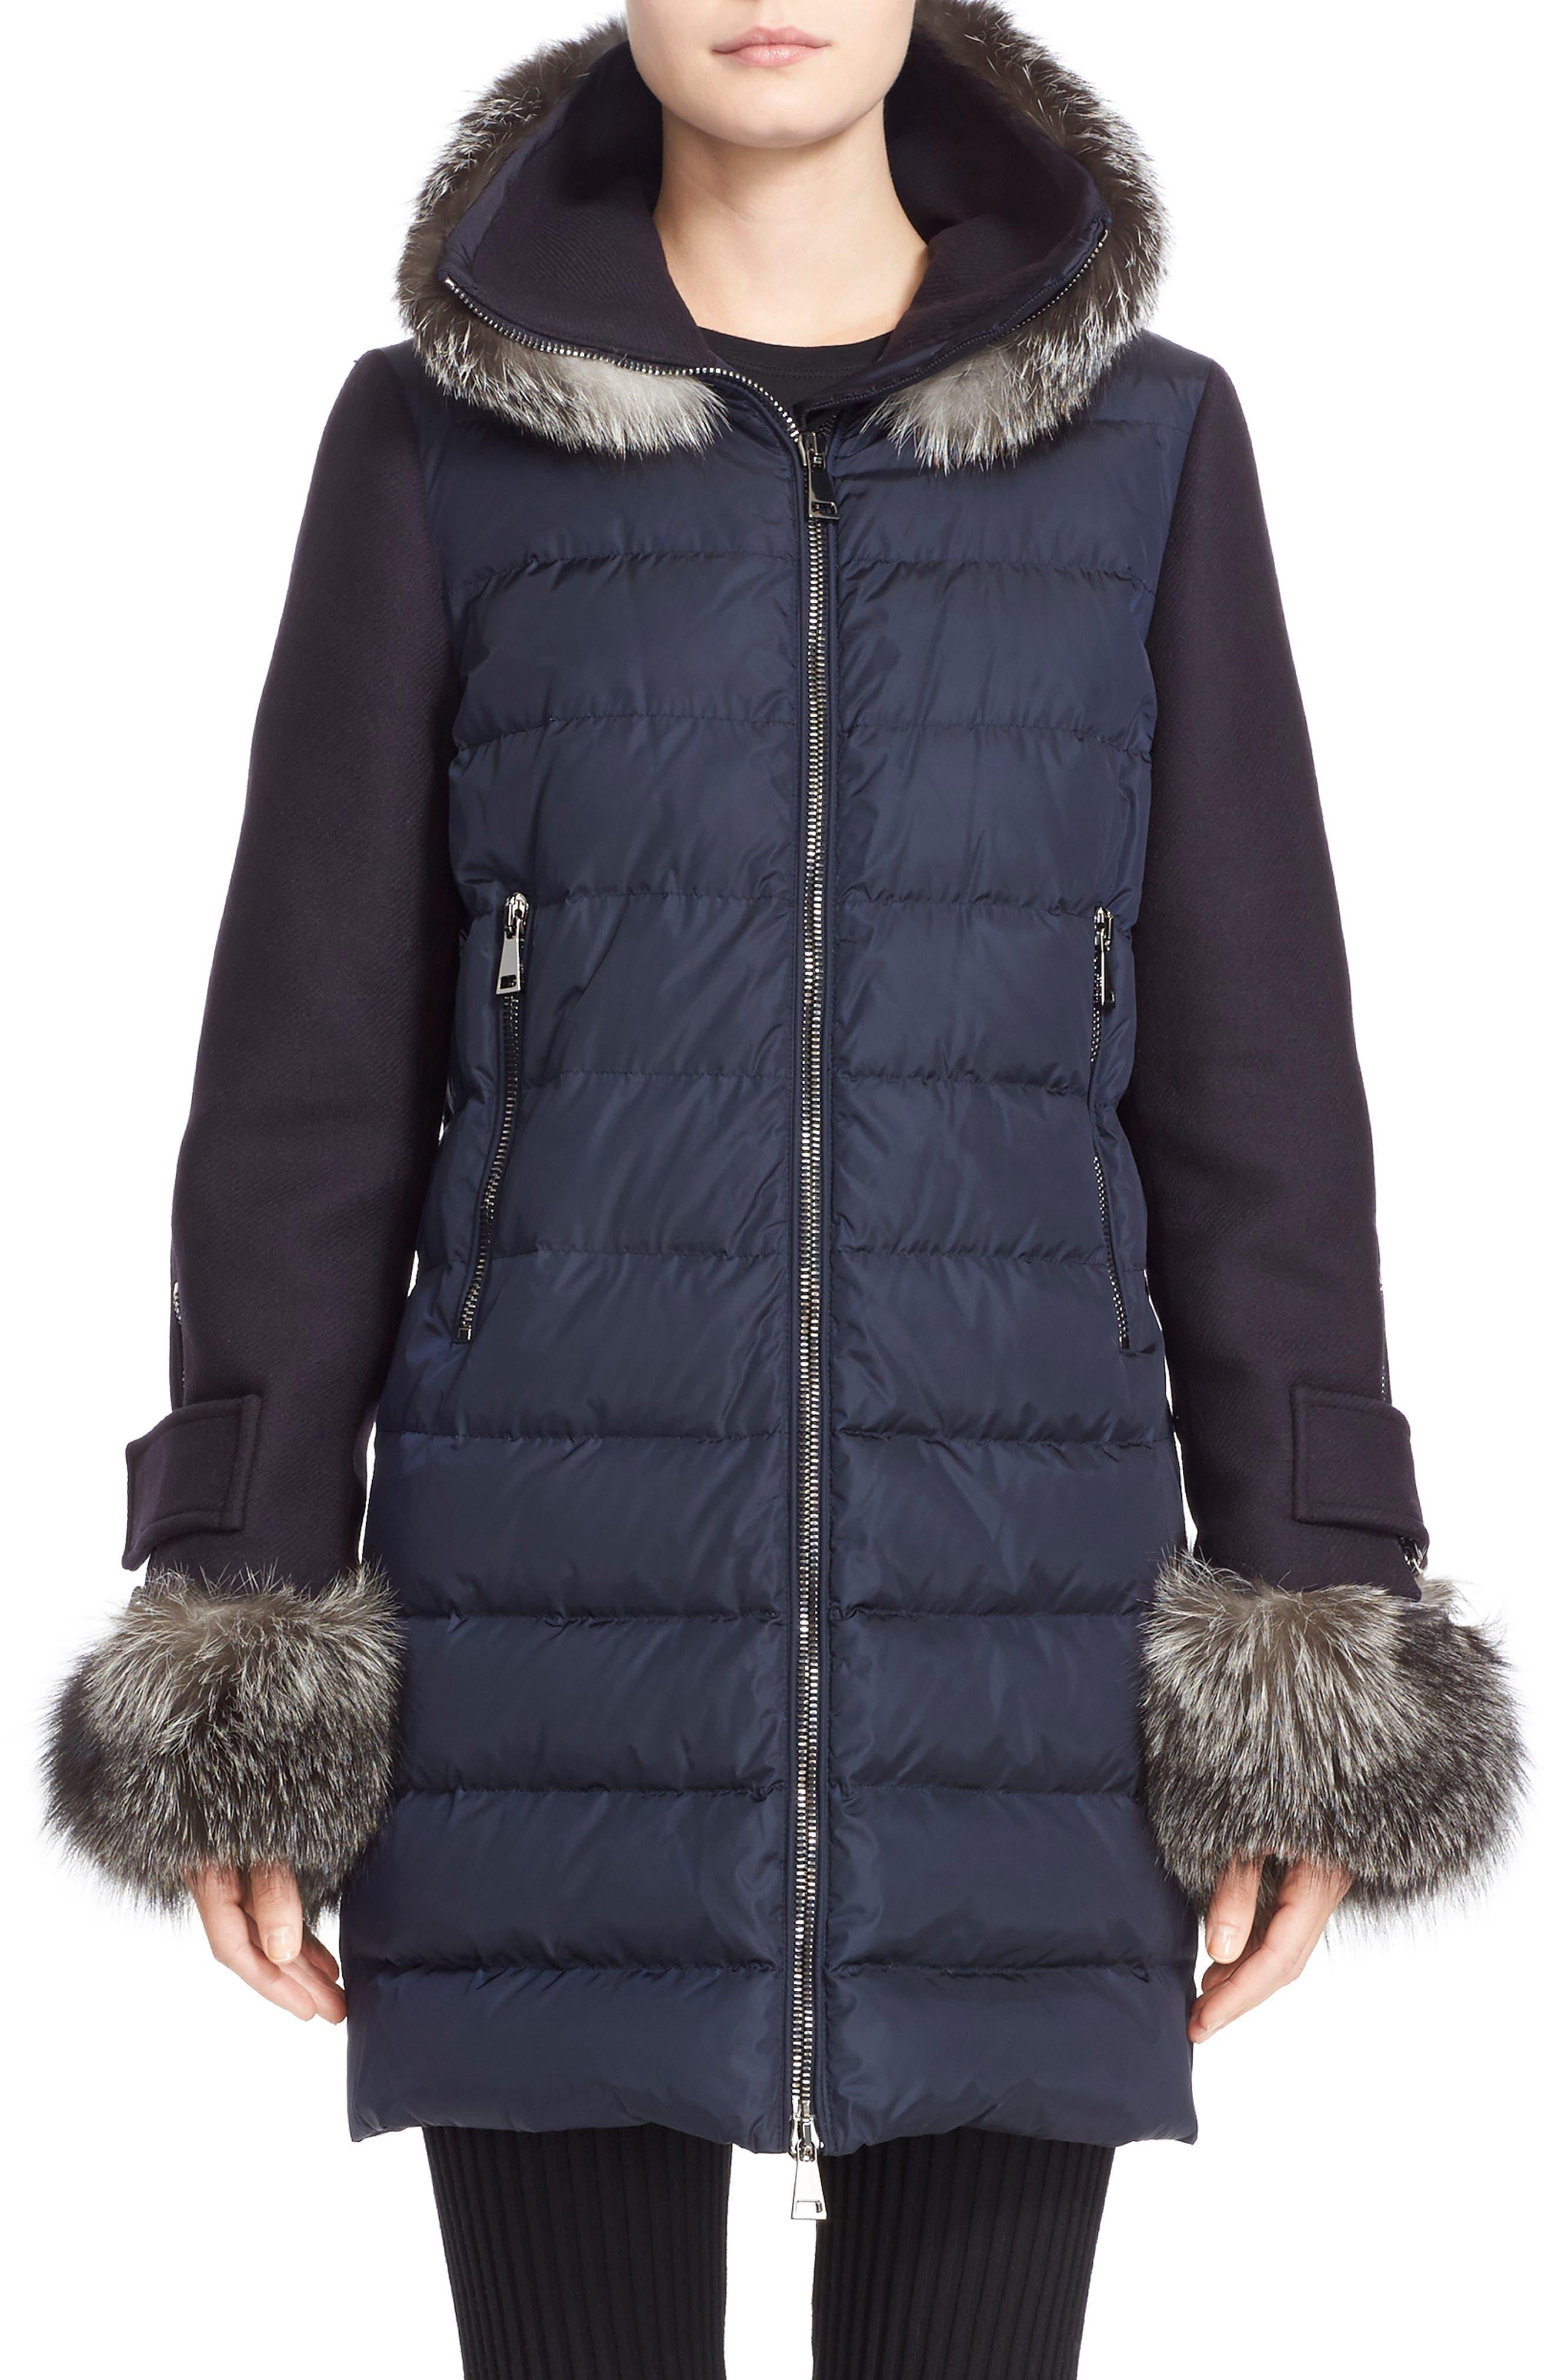 'Elestoria' Two-Piece Down Puffer Coat with Genuine Fox Fur Trim,                             Main thumbnail 1, color,                             419